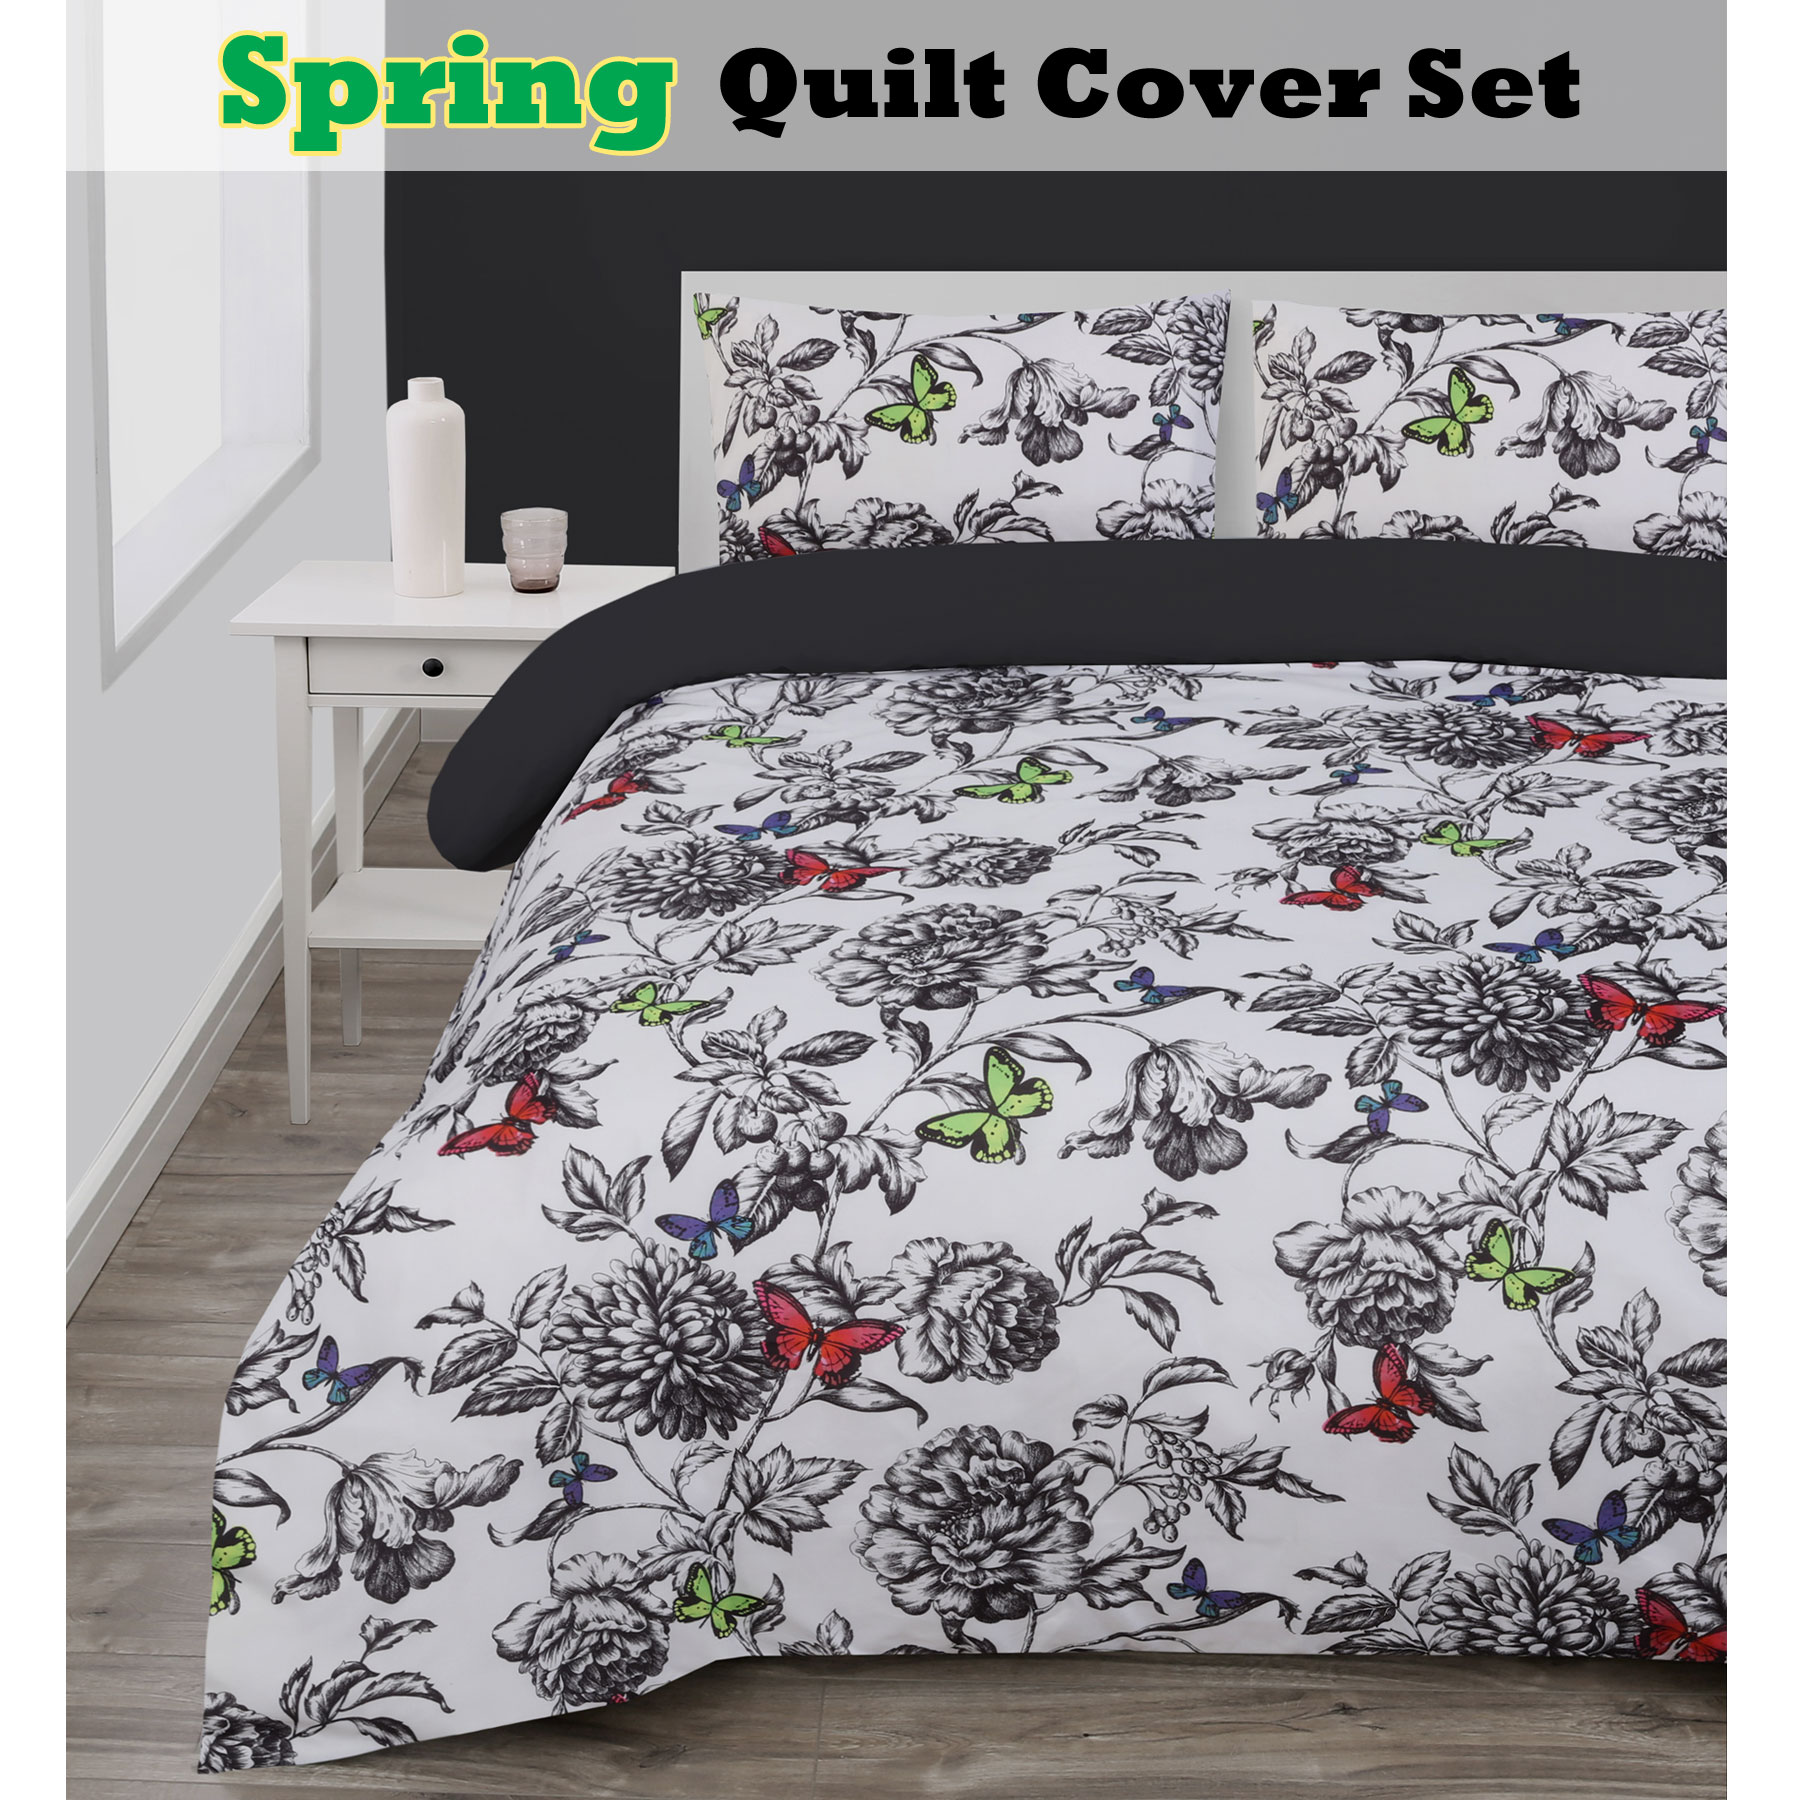 3 pce spring butterfly floral quilt doona duvet cover set queen king ebay. Black Bedroom Furniture Sets. Home Design Ideas